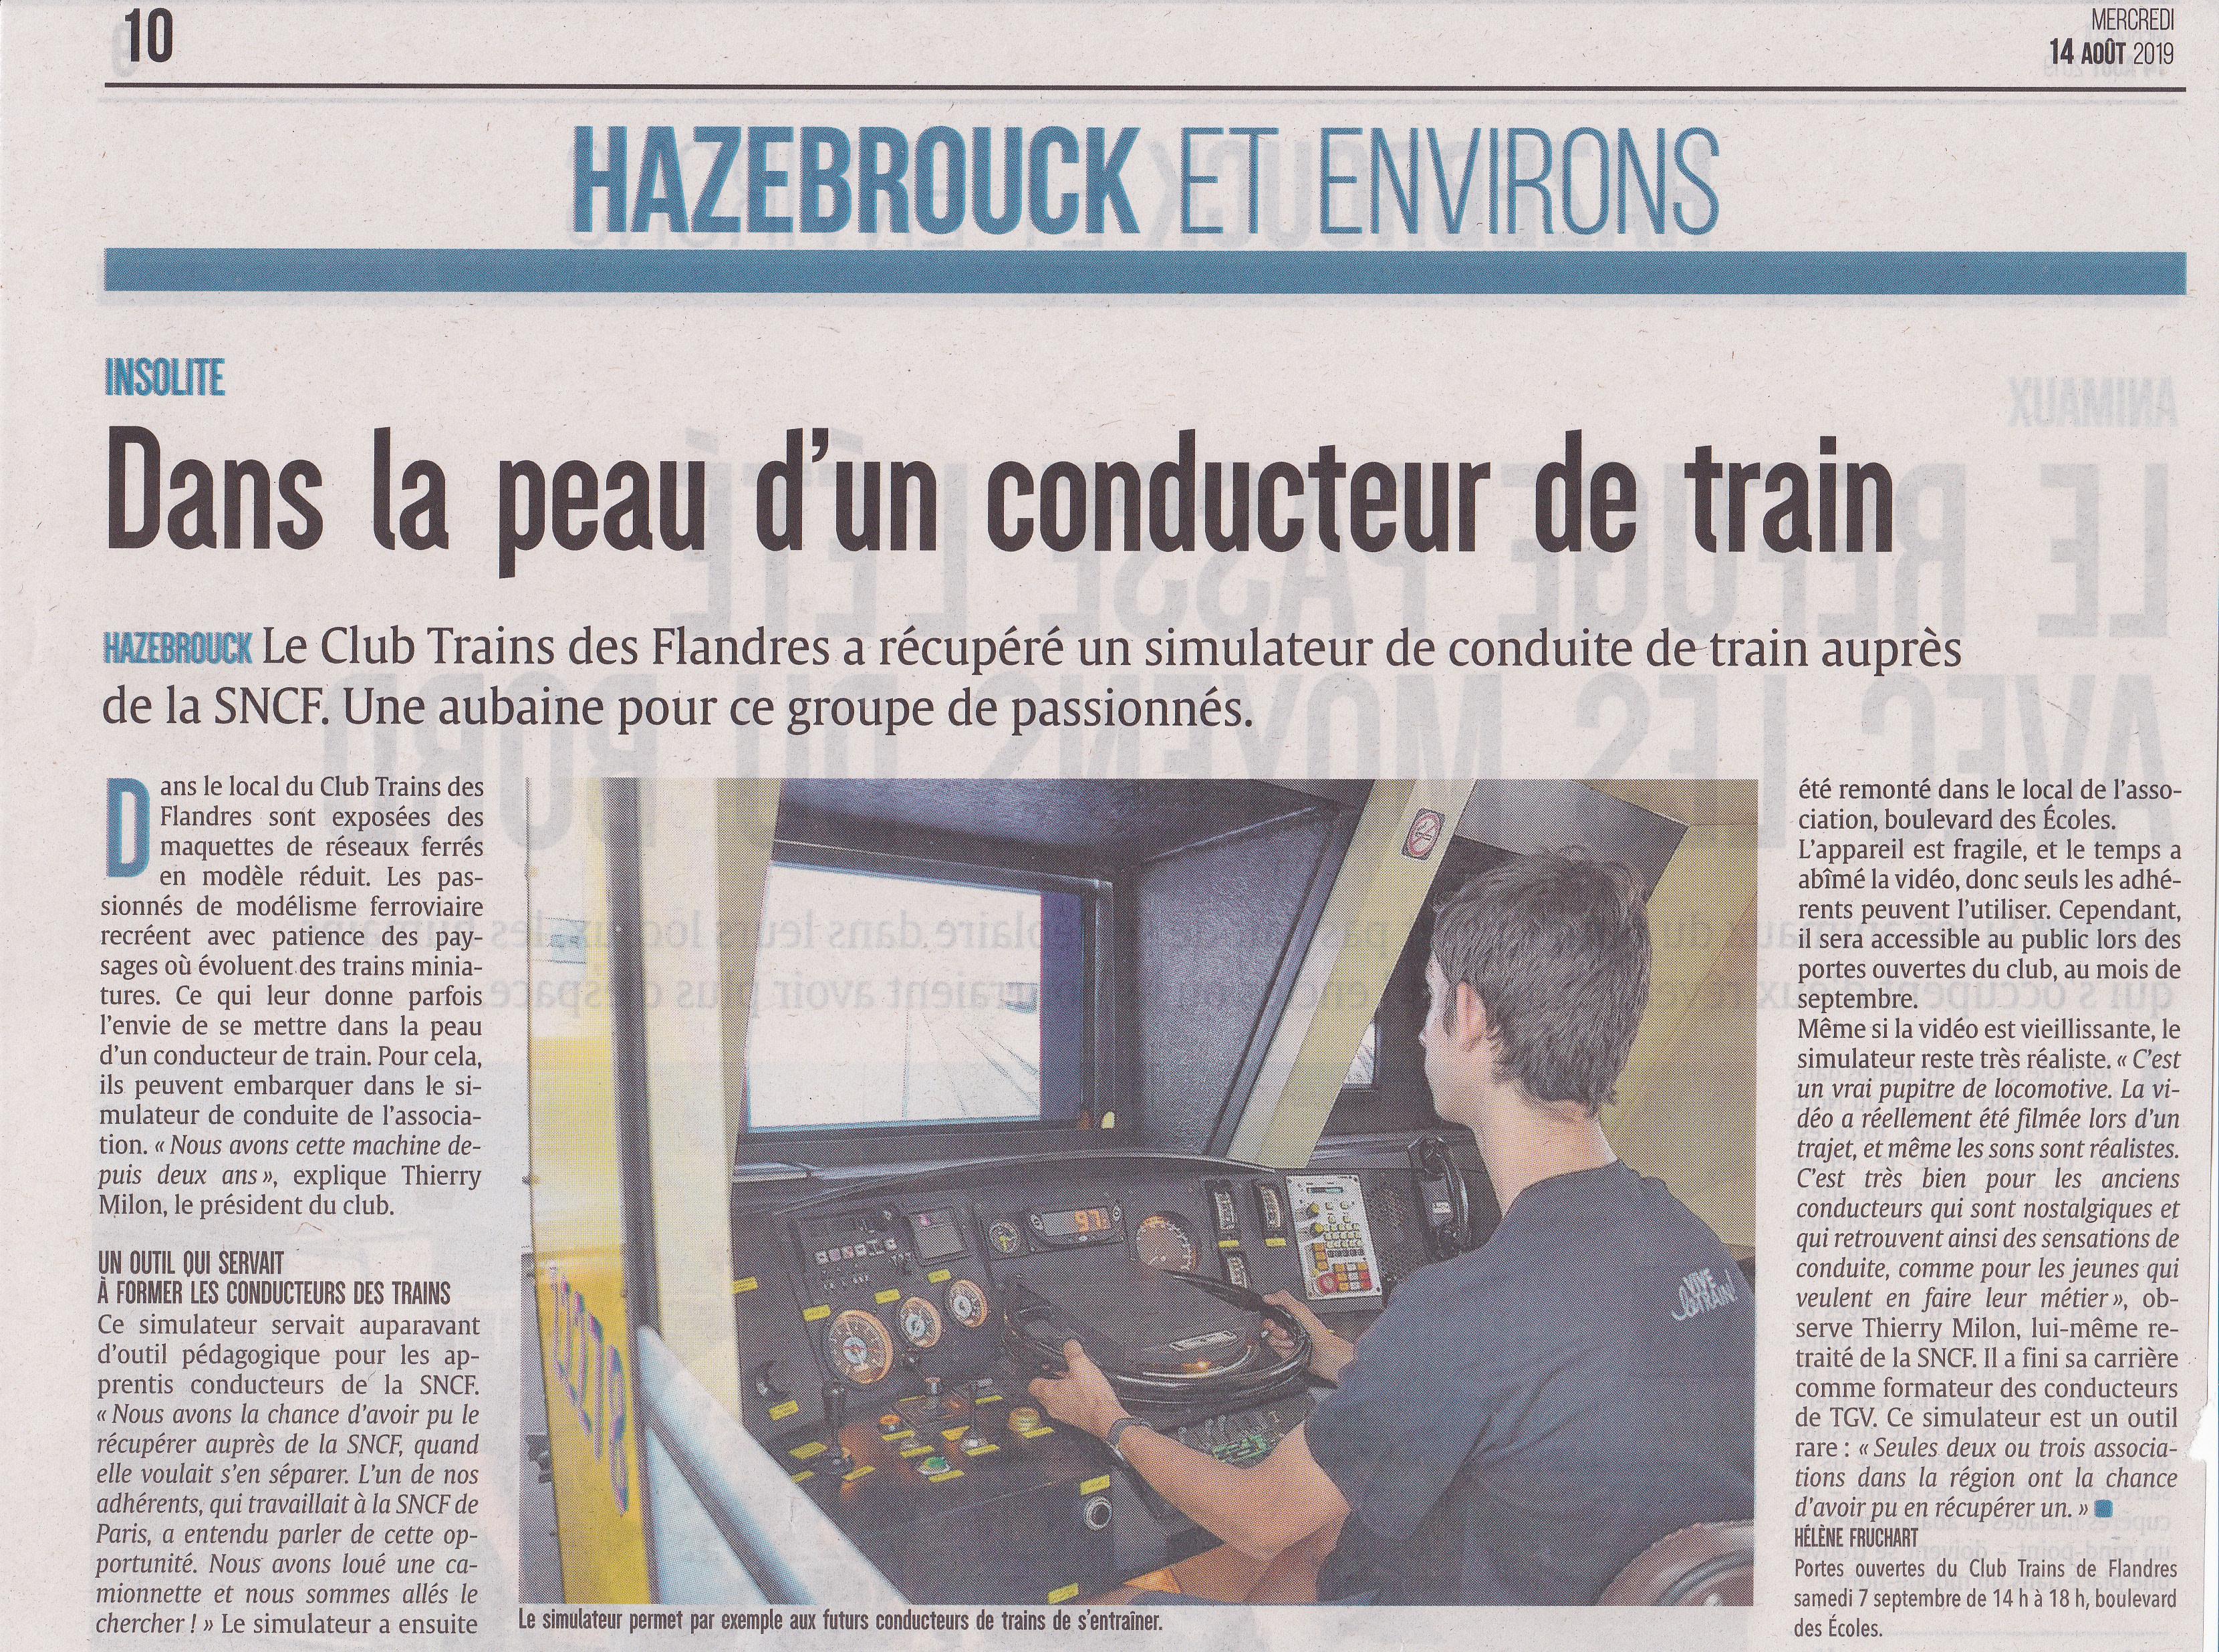 L'Indicateur – Mercredi 14 aout 2019